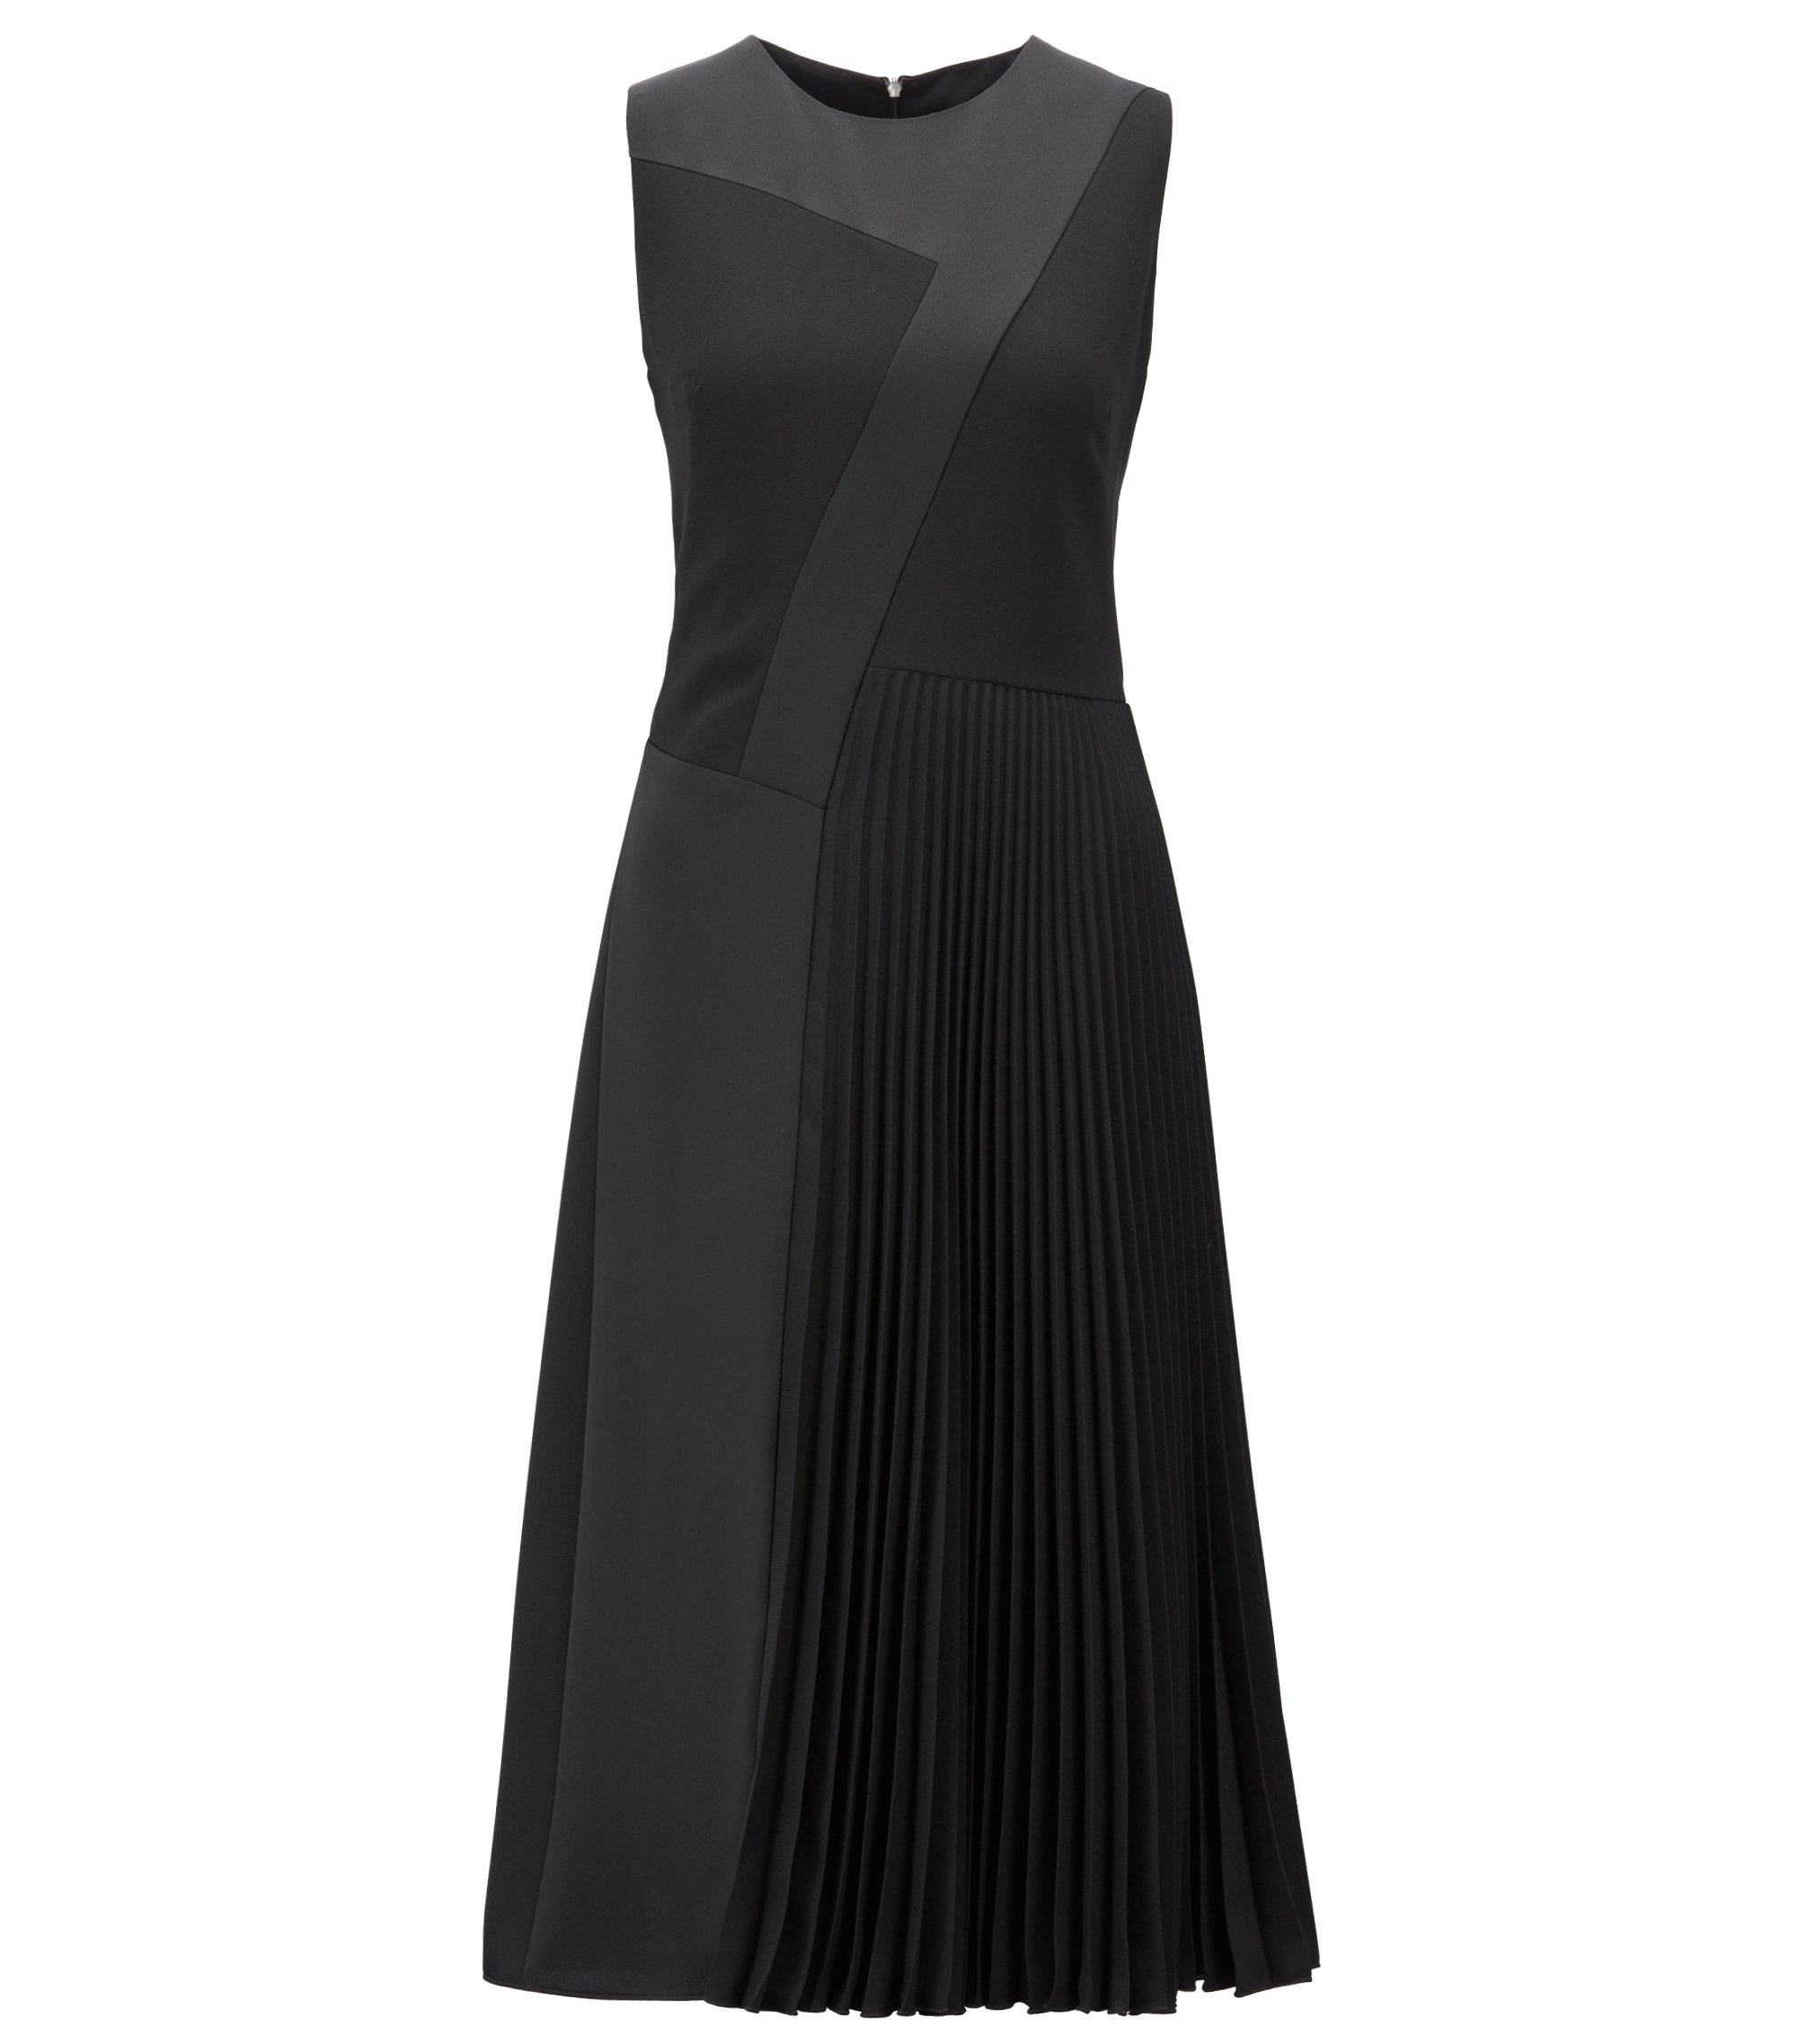 Patchwork midi dress in crepe with plissé skirt detail, Black